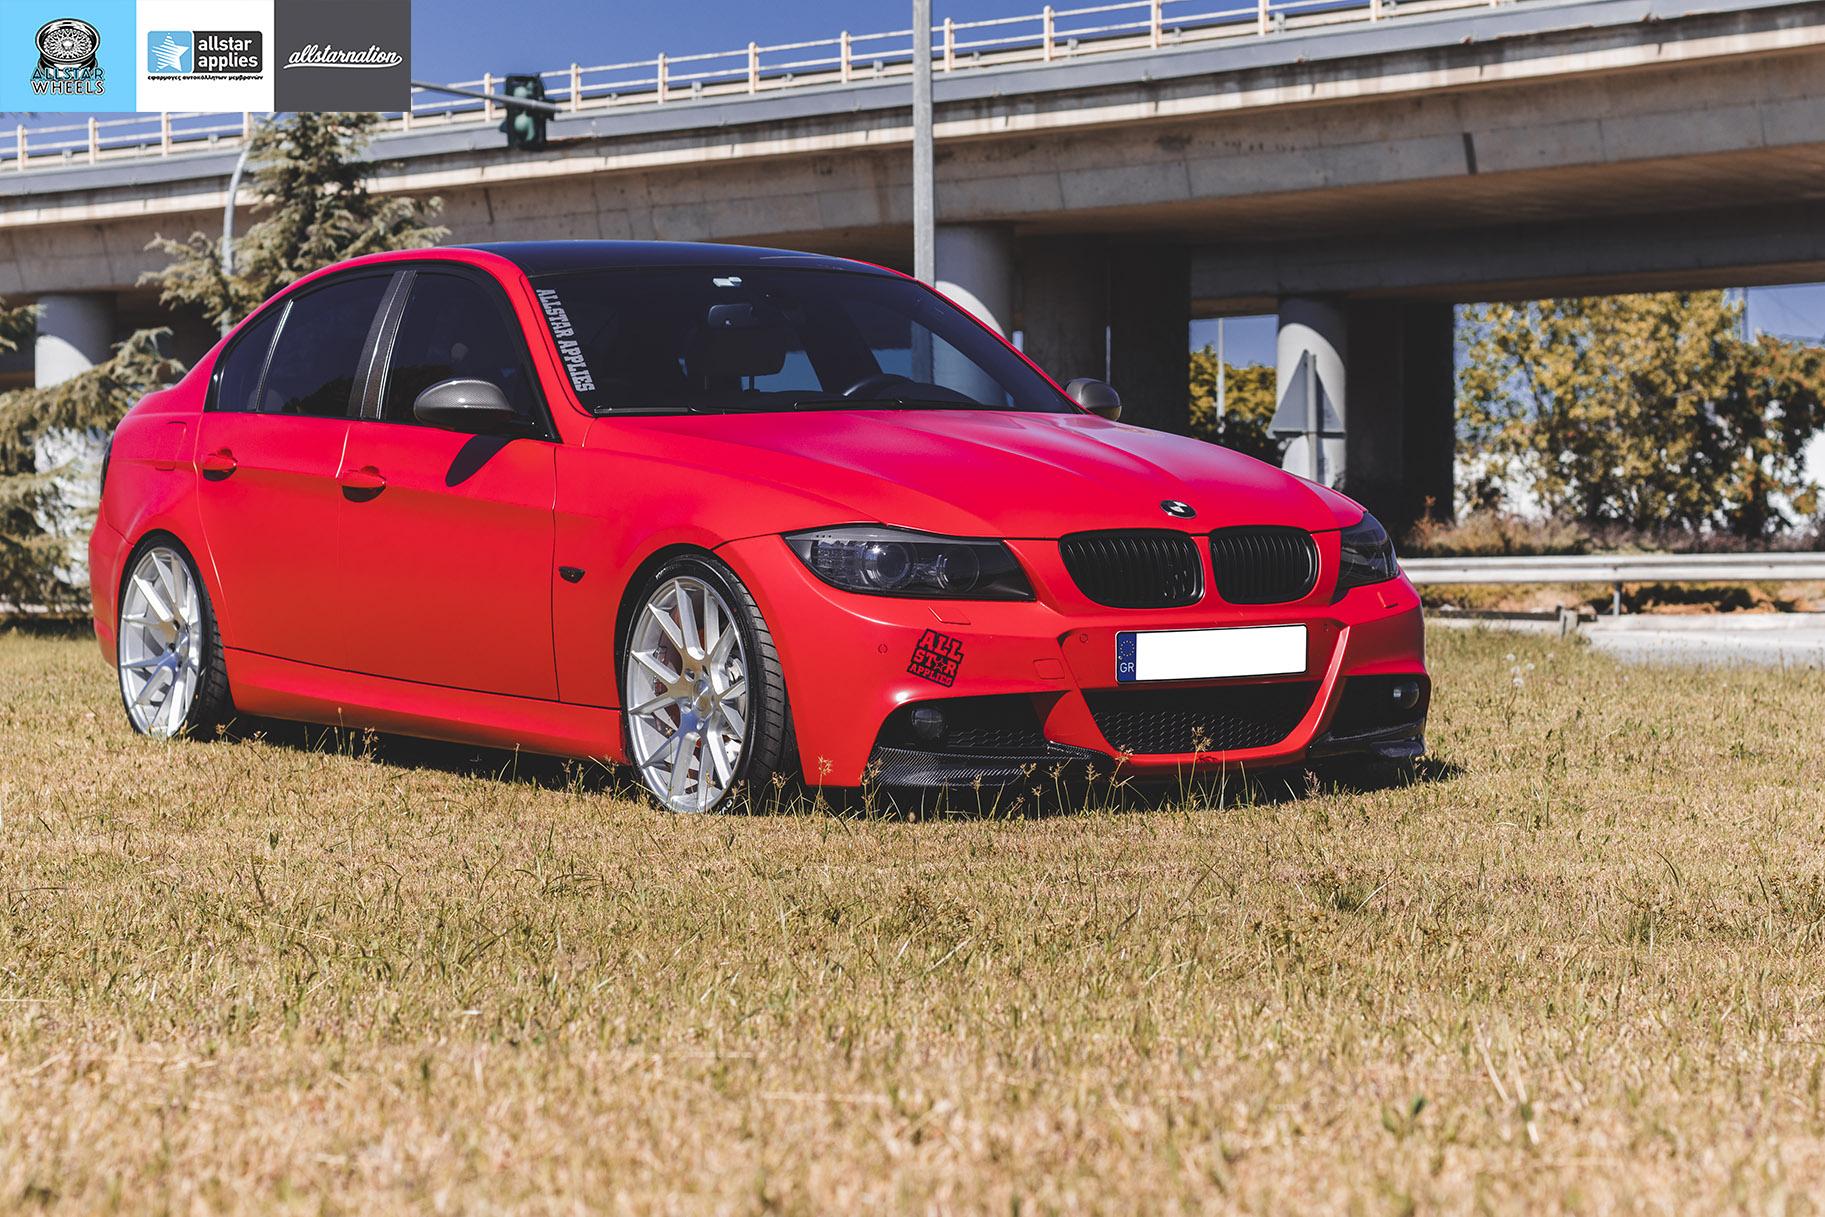 BMW E90 M-Pack - Satin Imperial Red μεμβράνες αλλαγής χρώματος θεσσαλονίκη allstar applies